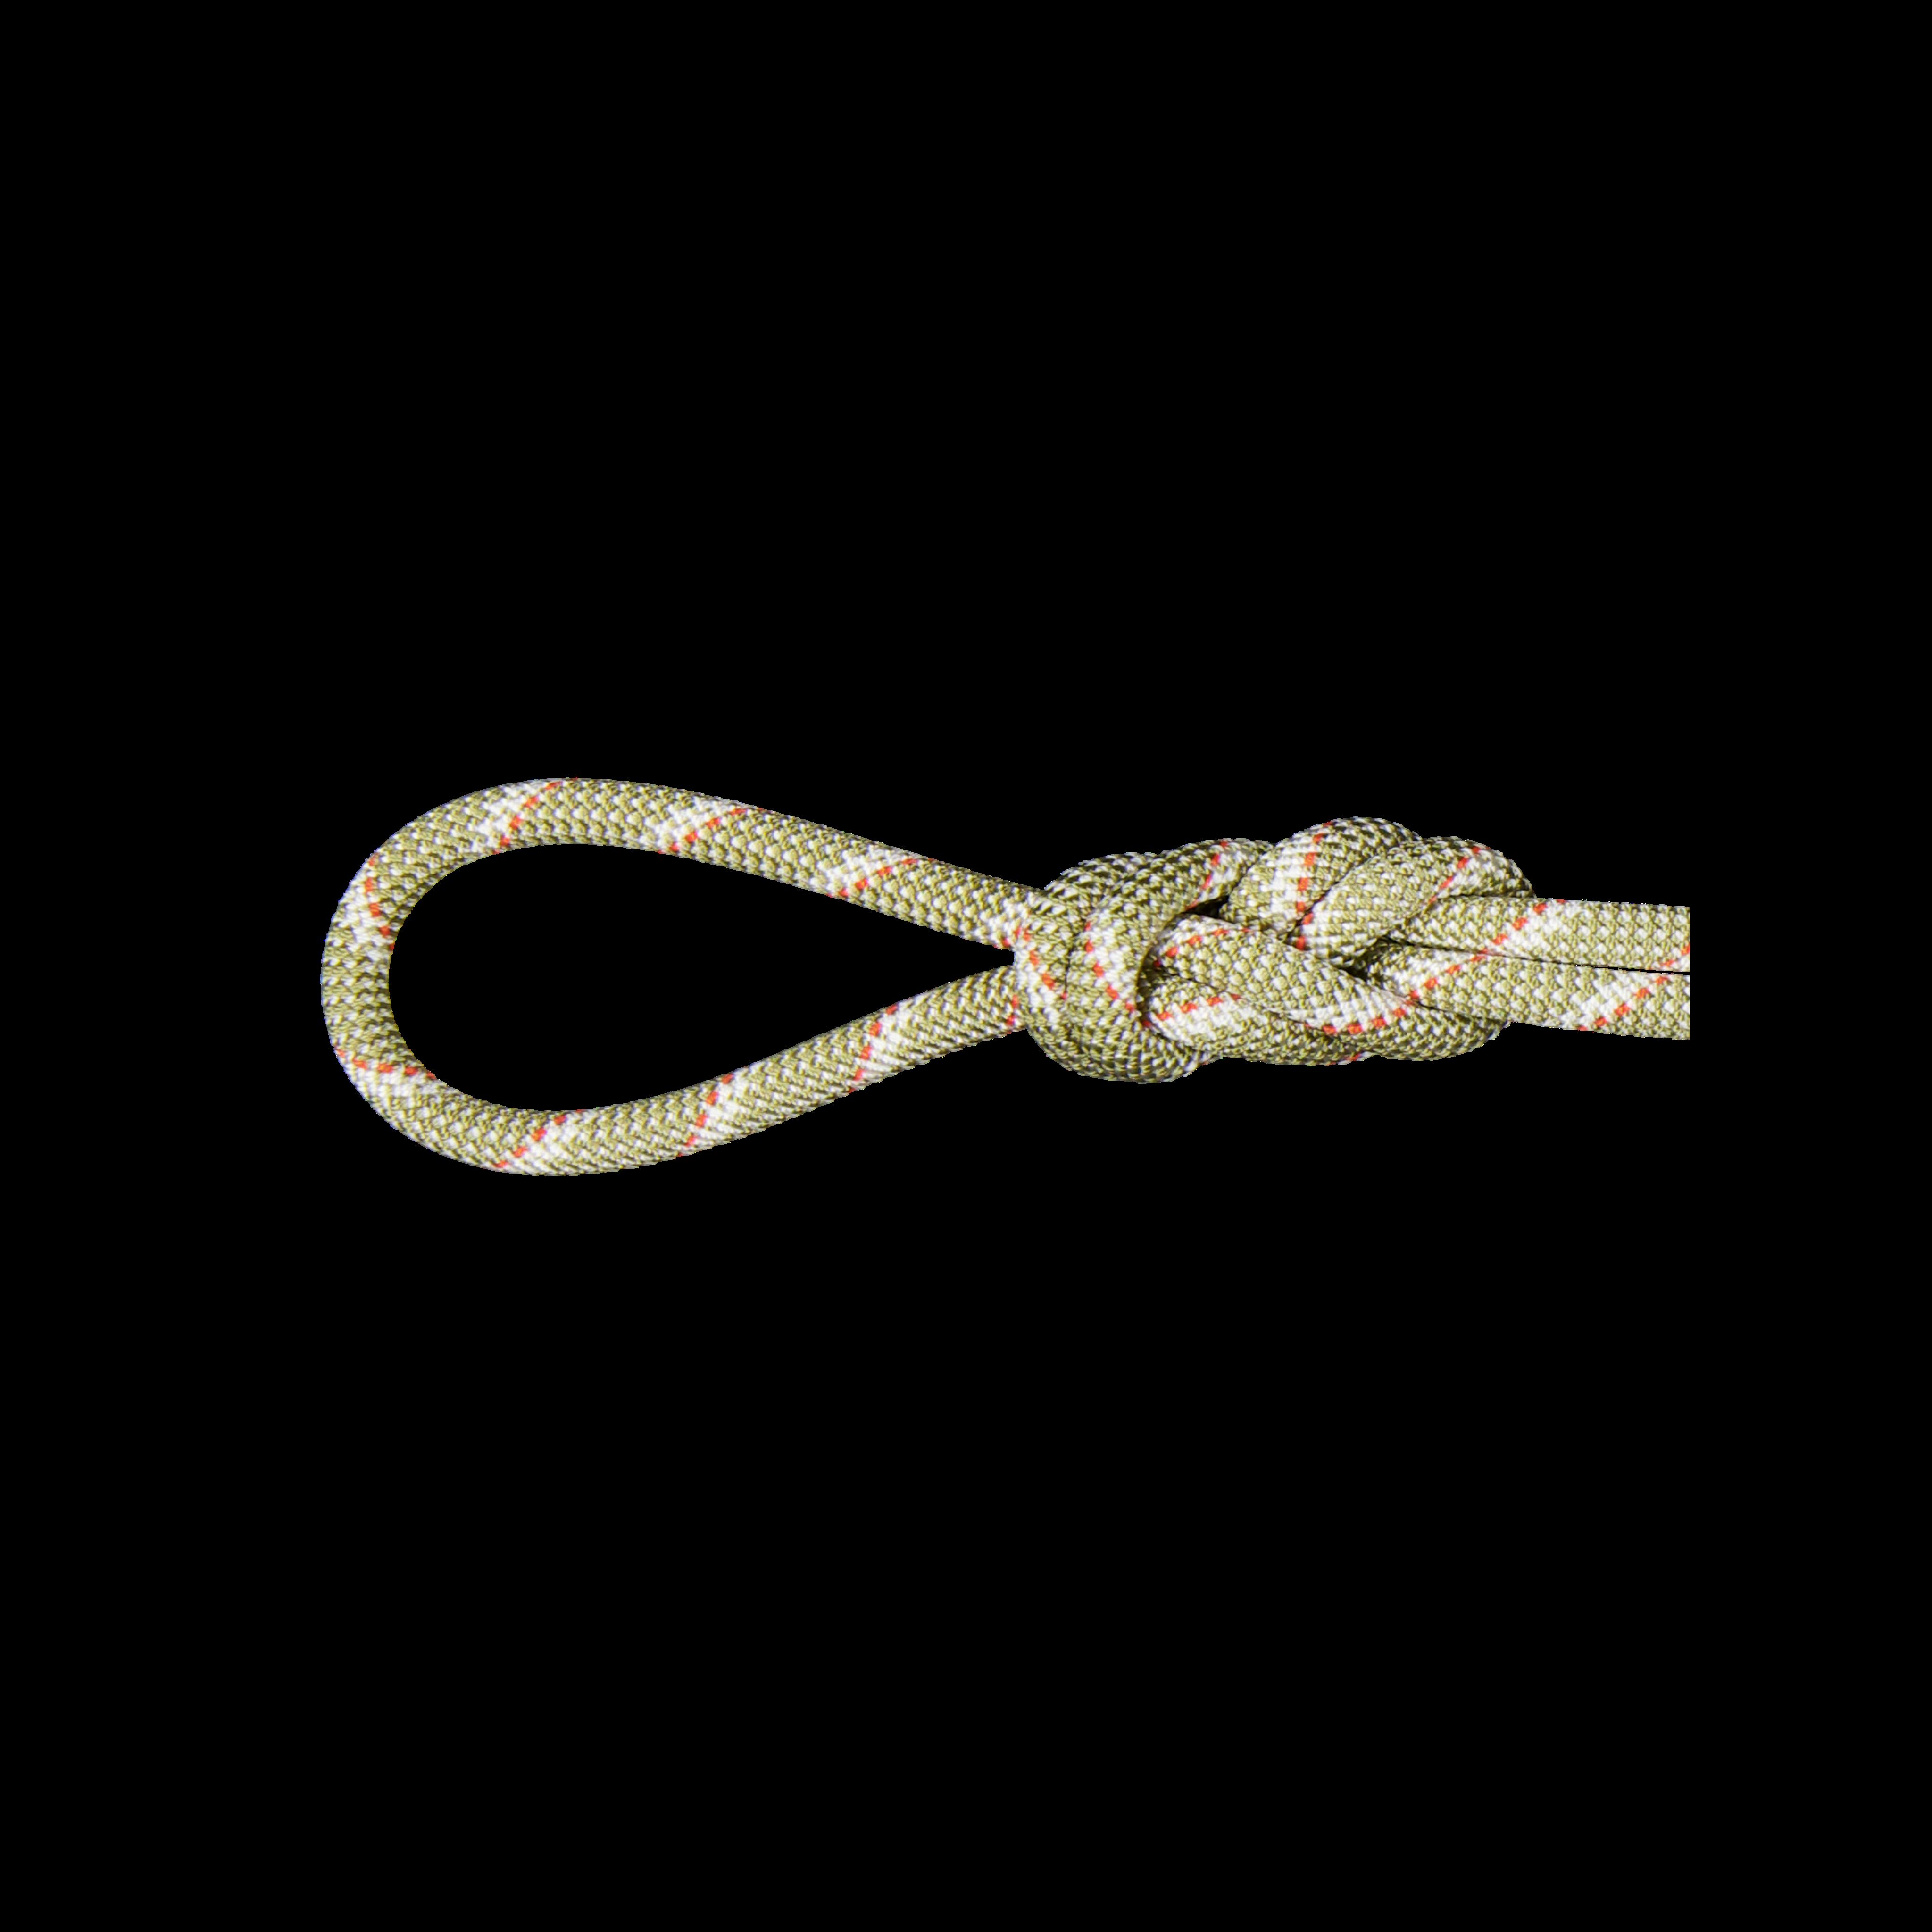 8.0 Alpine Classic Rope product image